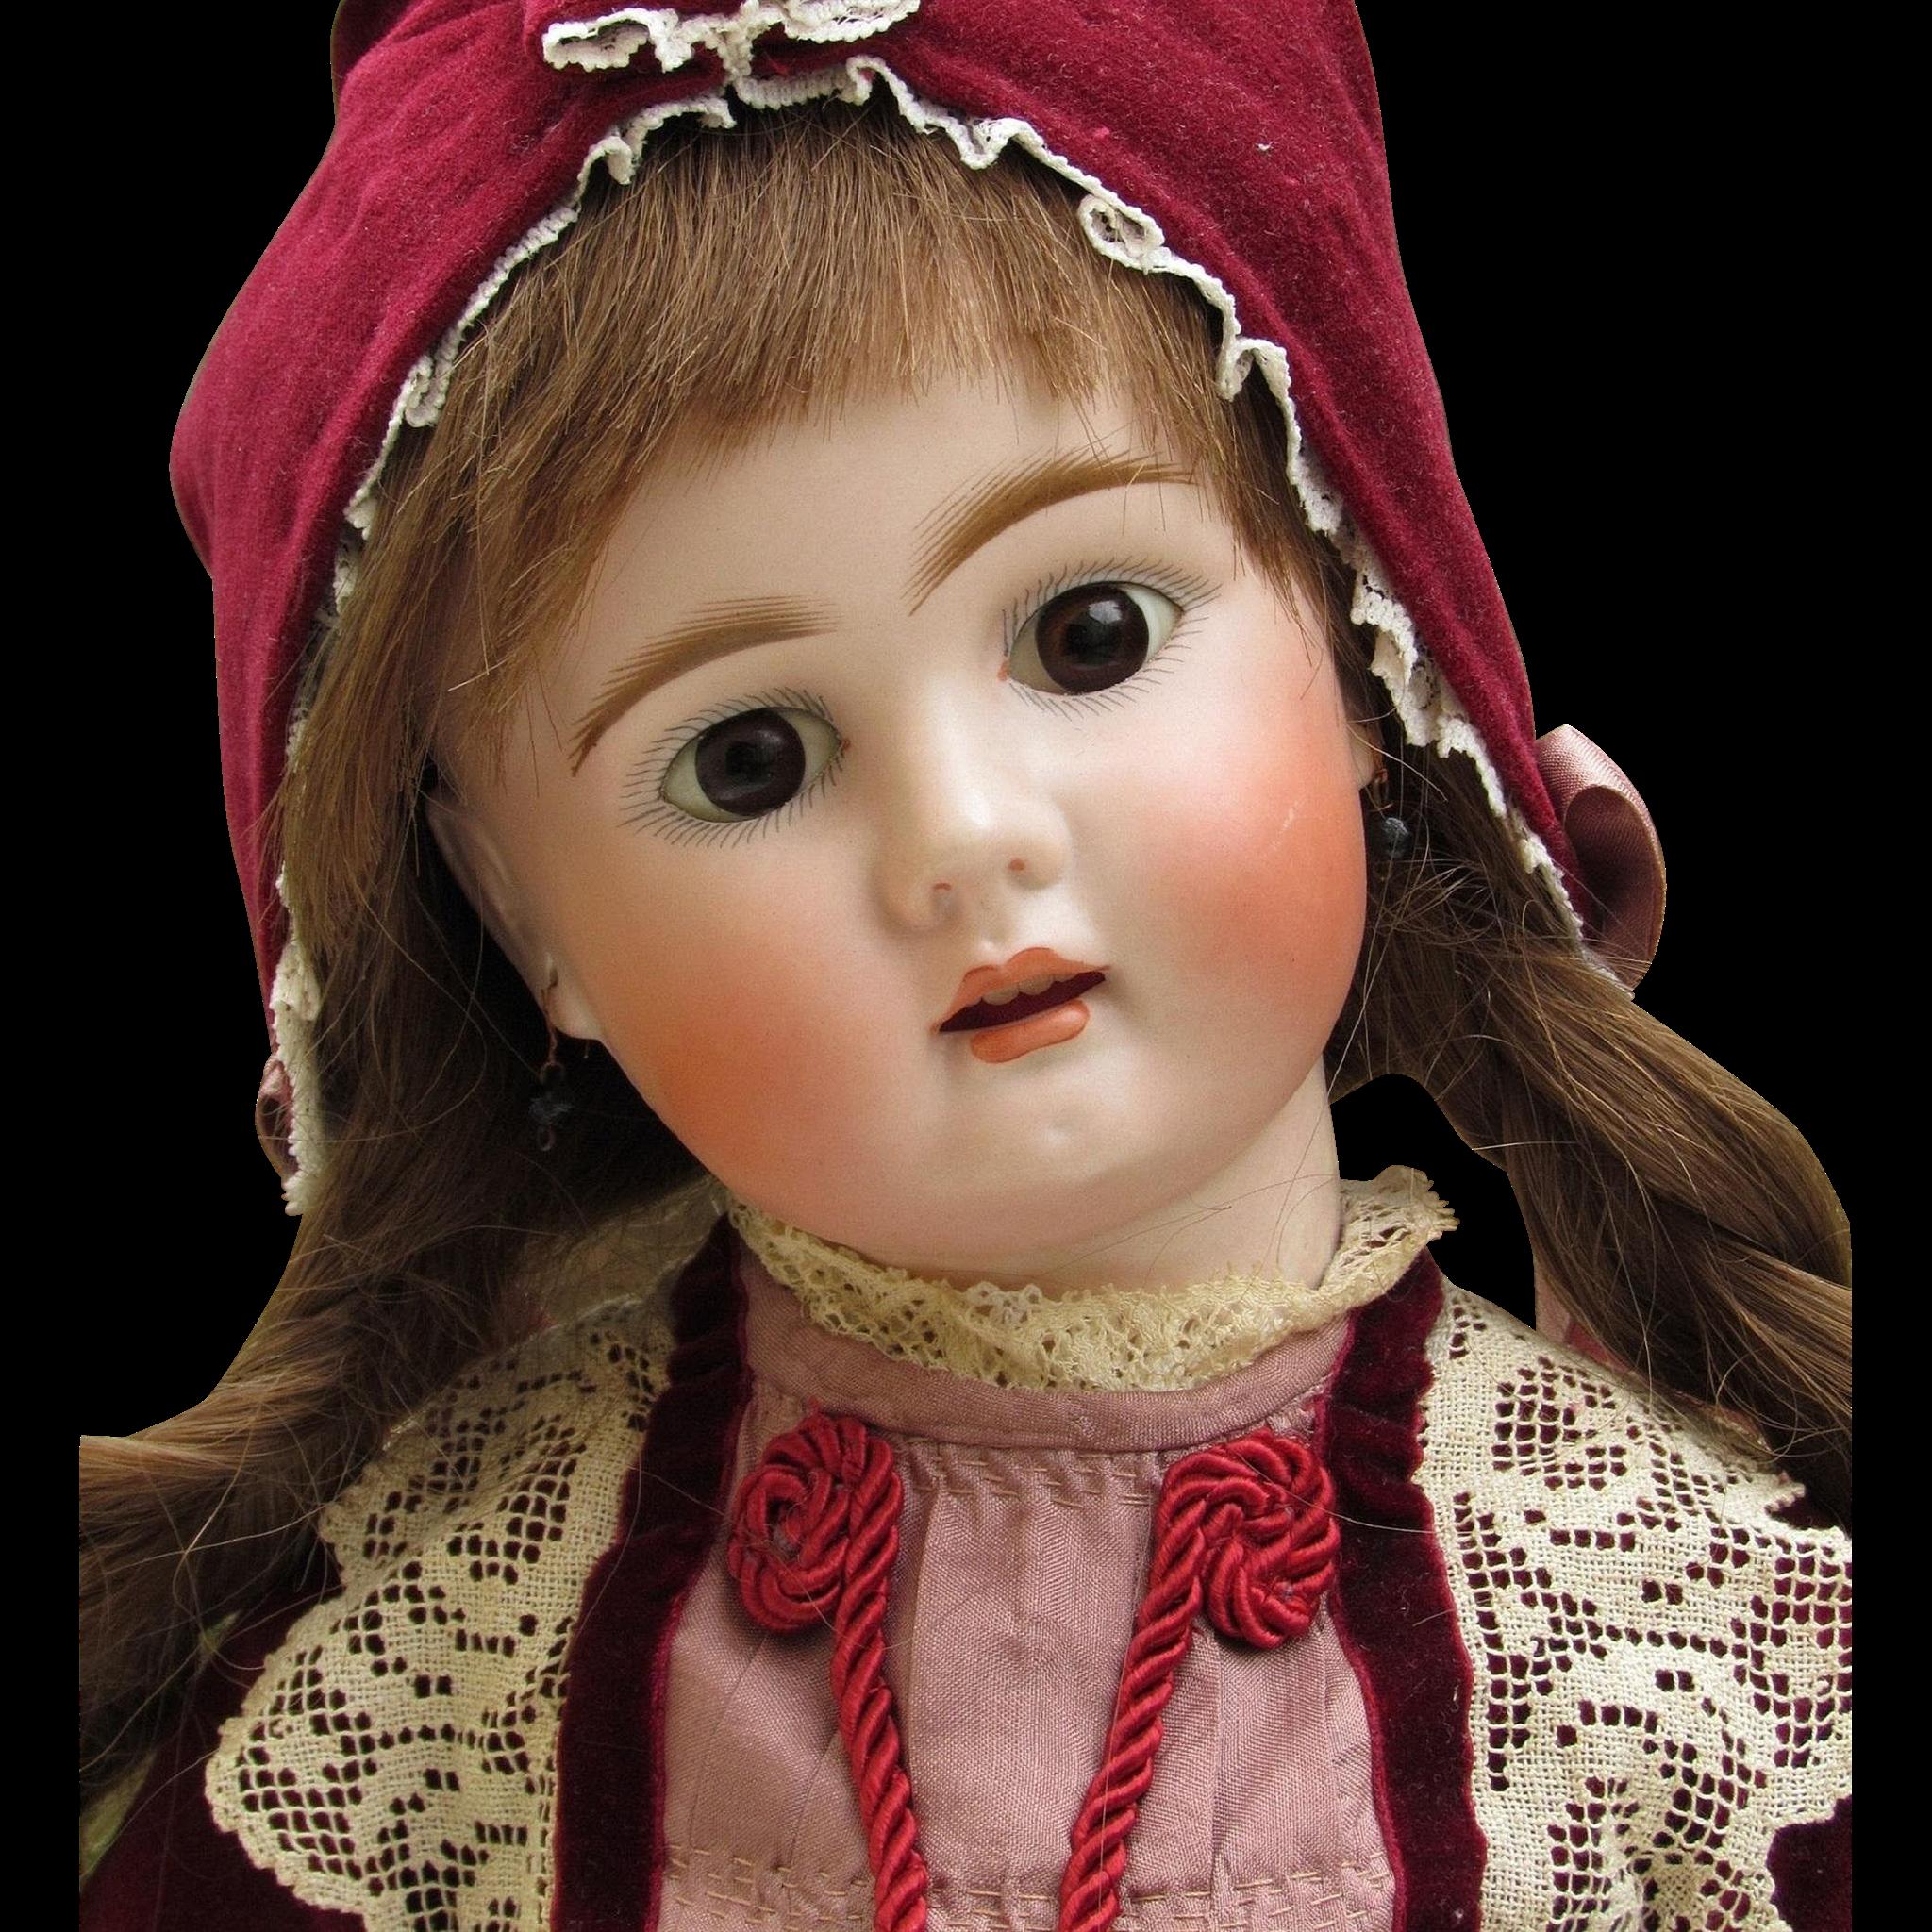 Darling 20 Antique German Sonneberg Doll by Bahr & Proschild Mold